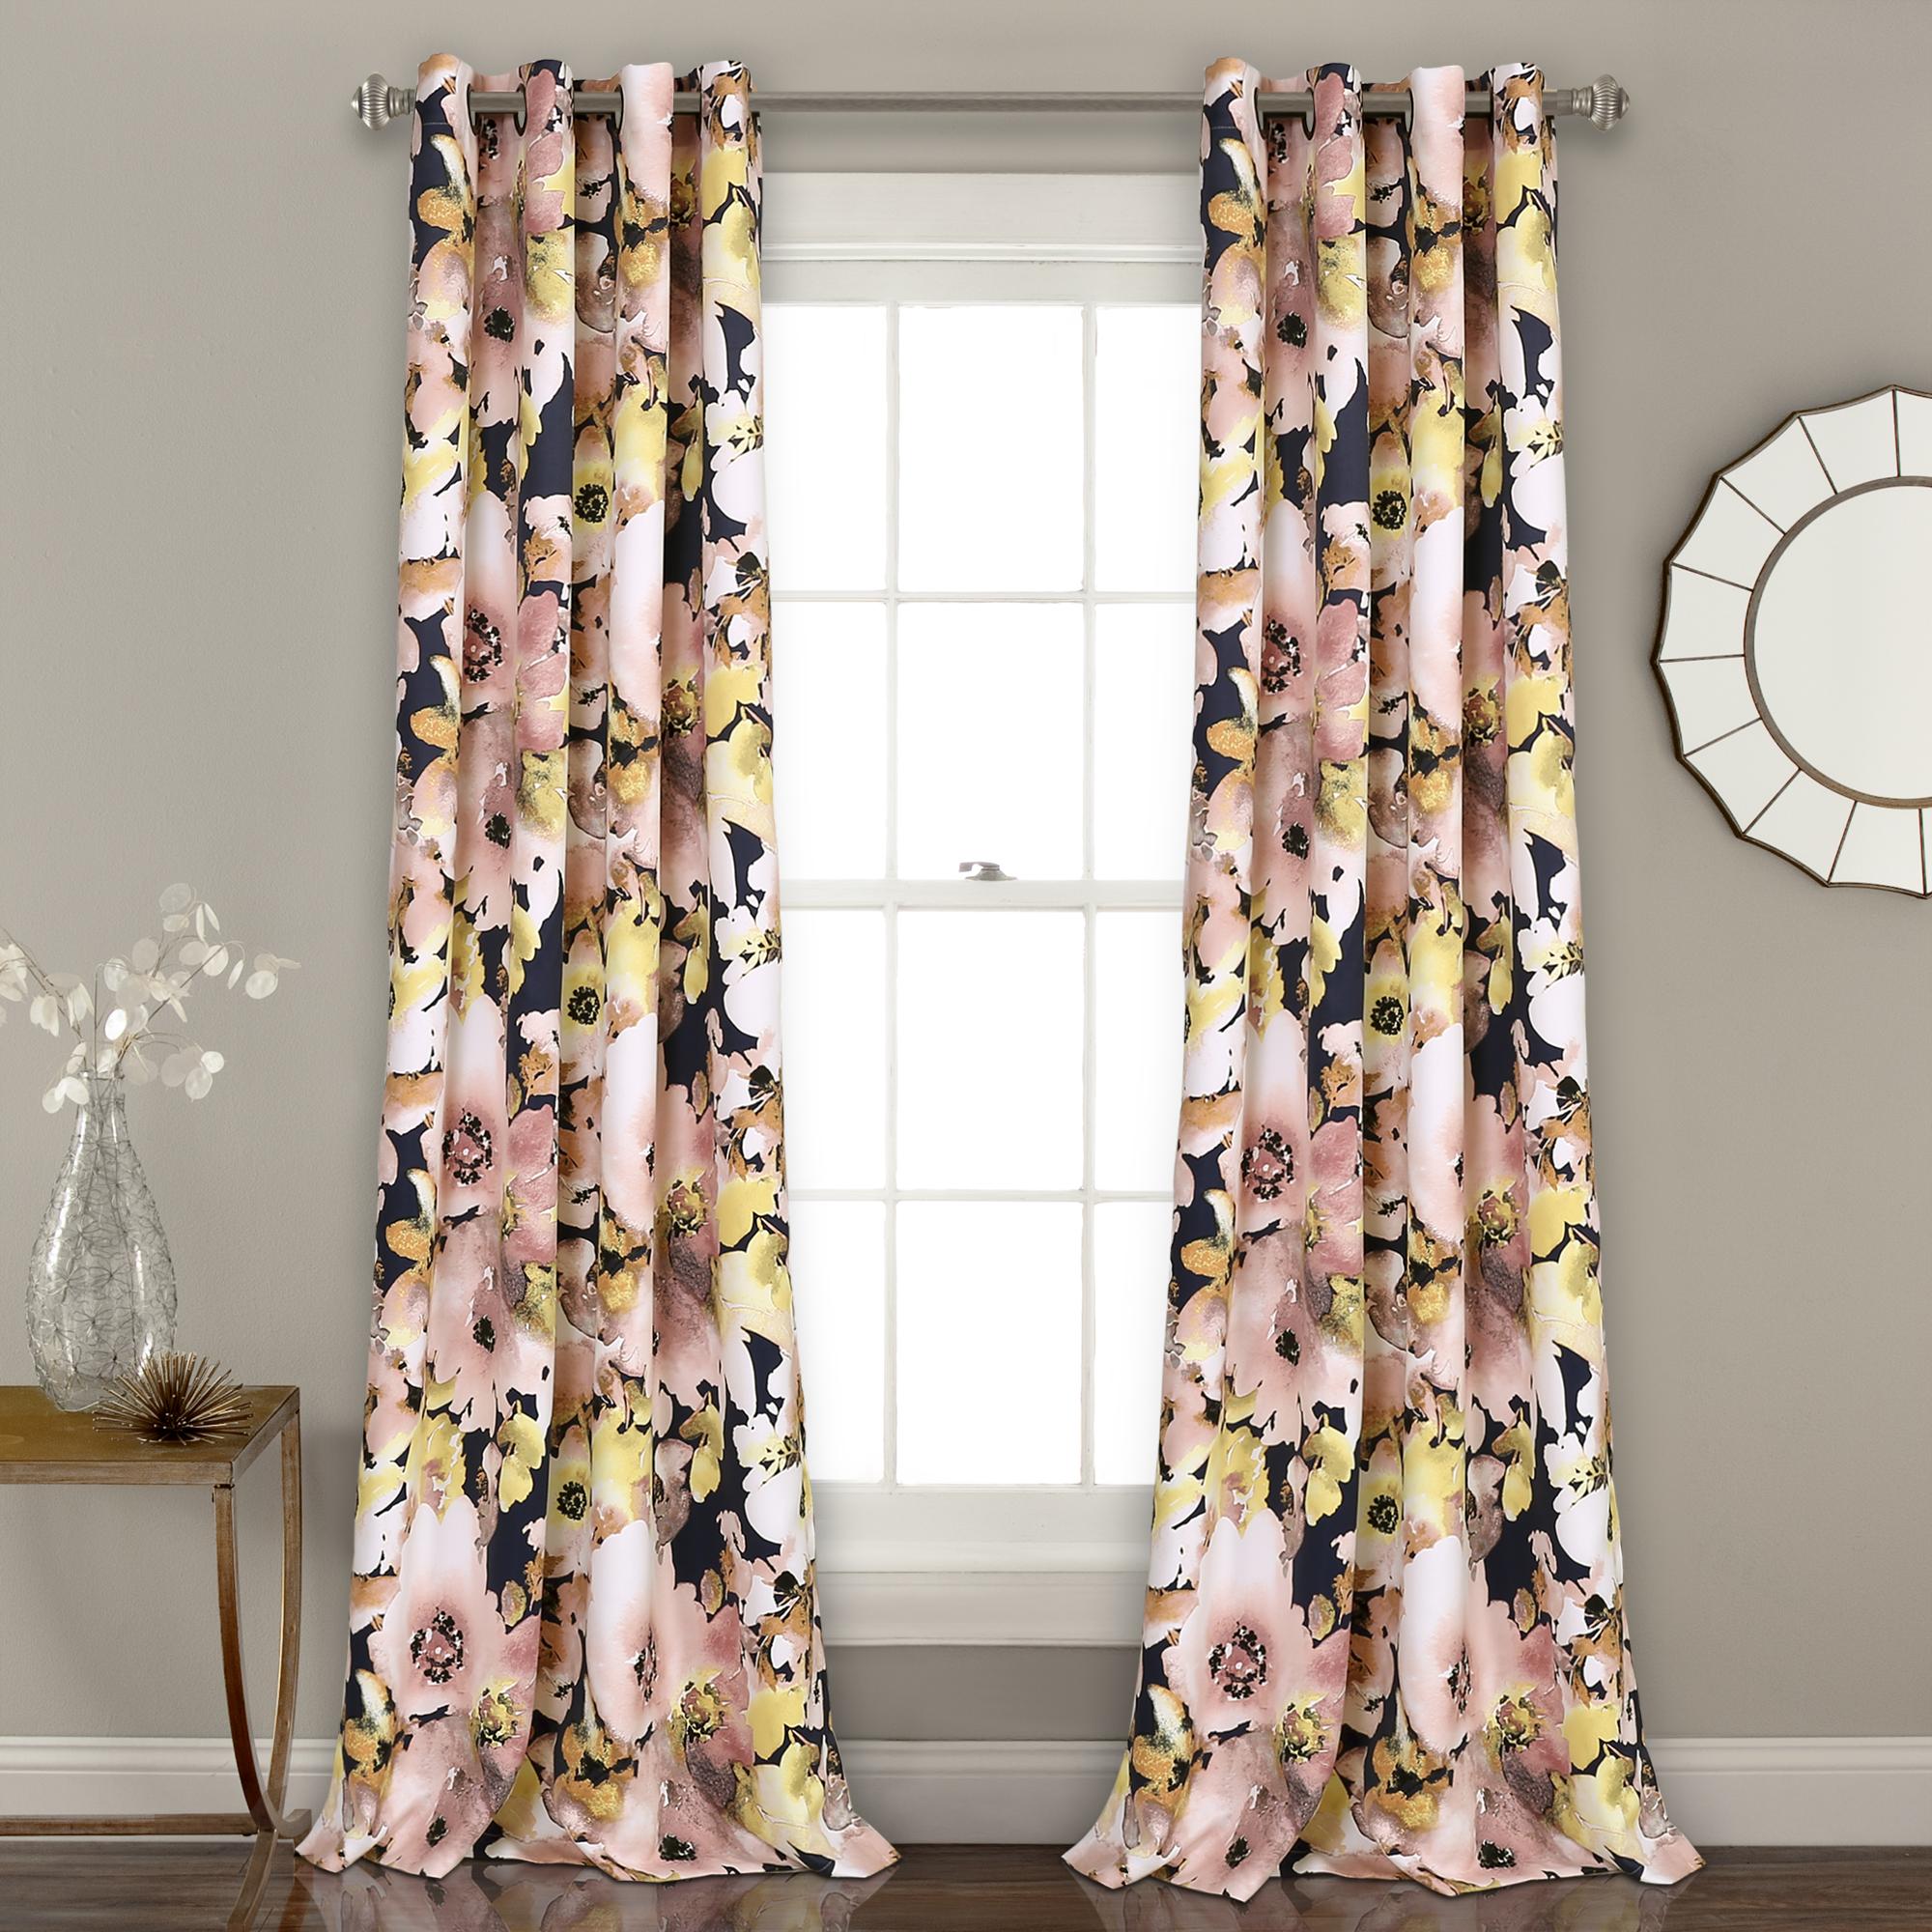 Floral Watercolor Room Darkening Window Curtain Panels